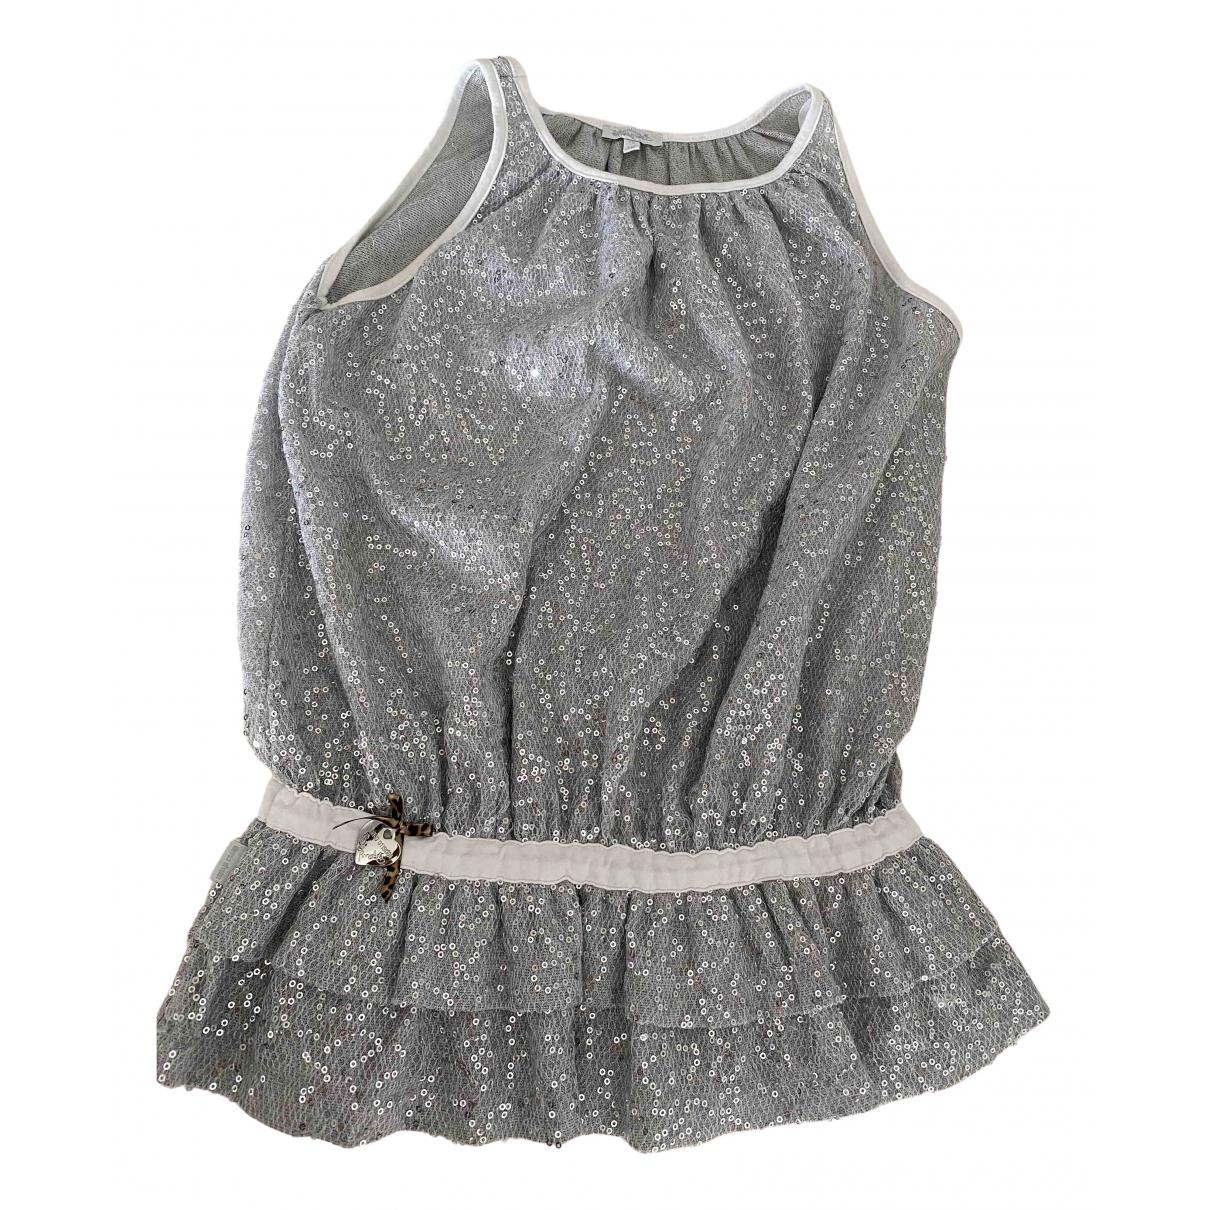 Roberto Cavalli N Silver Glitter dress for Kids 12 years - XS UK